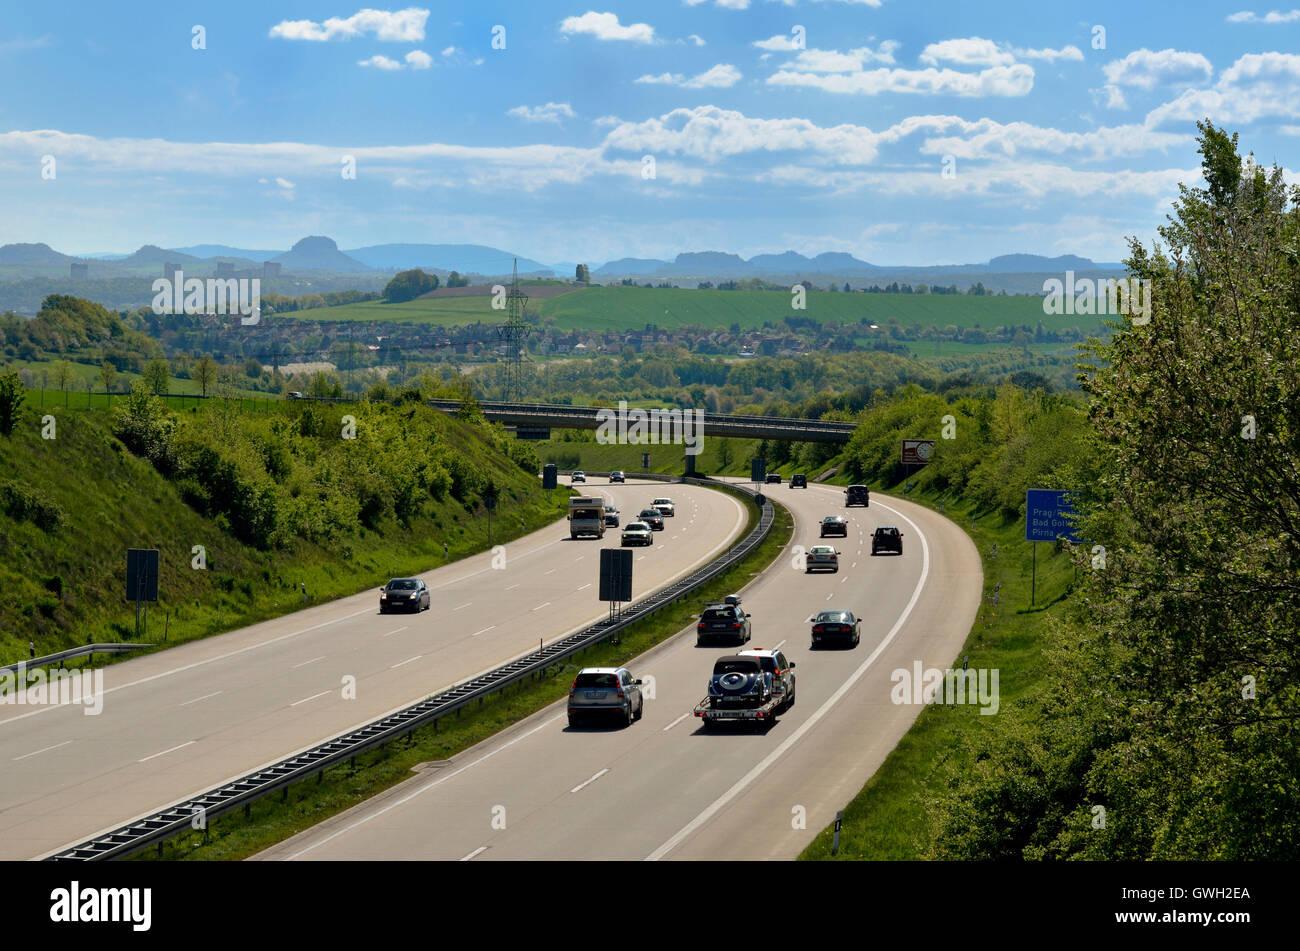 Autobahn A 17, Autobahn A 17 Vor Dem Elbsandsteingebirge Stockbild